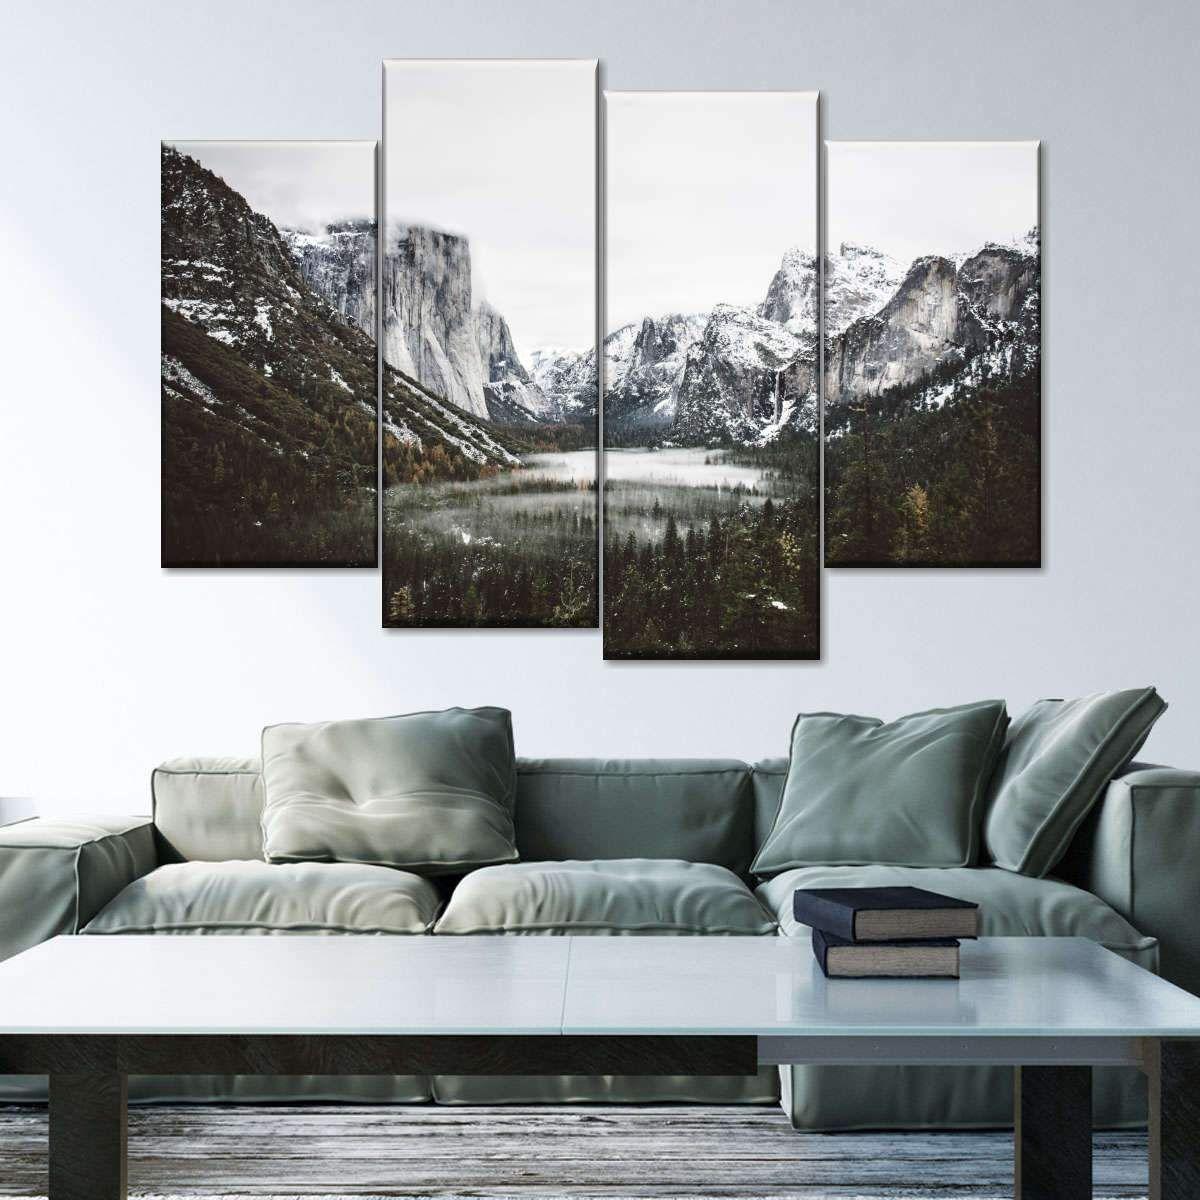 Yosemite Winter Magic Multi Panel Canvas Wall Art In 2020 Canvas Wall Art Multi Panel Canvas Wall Art